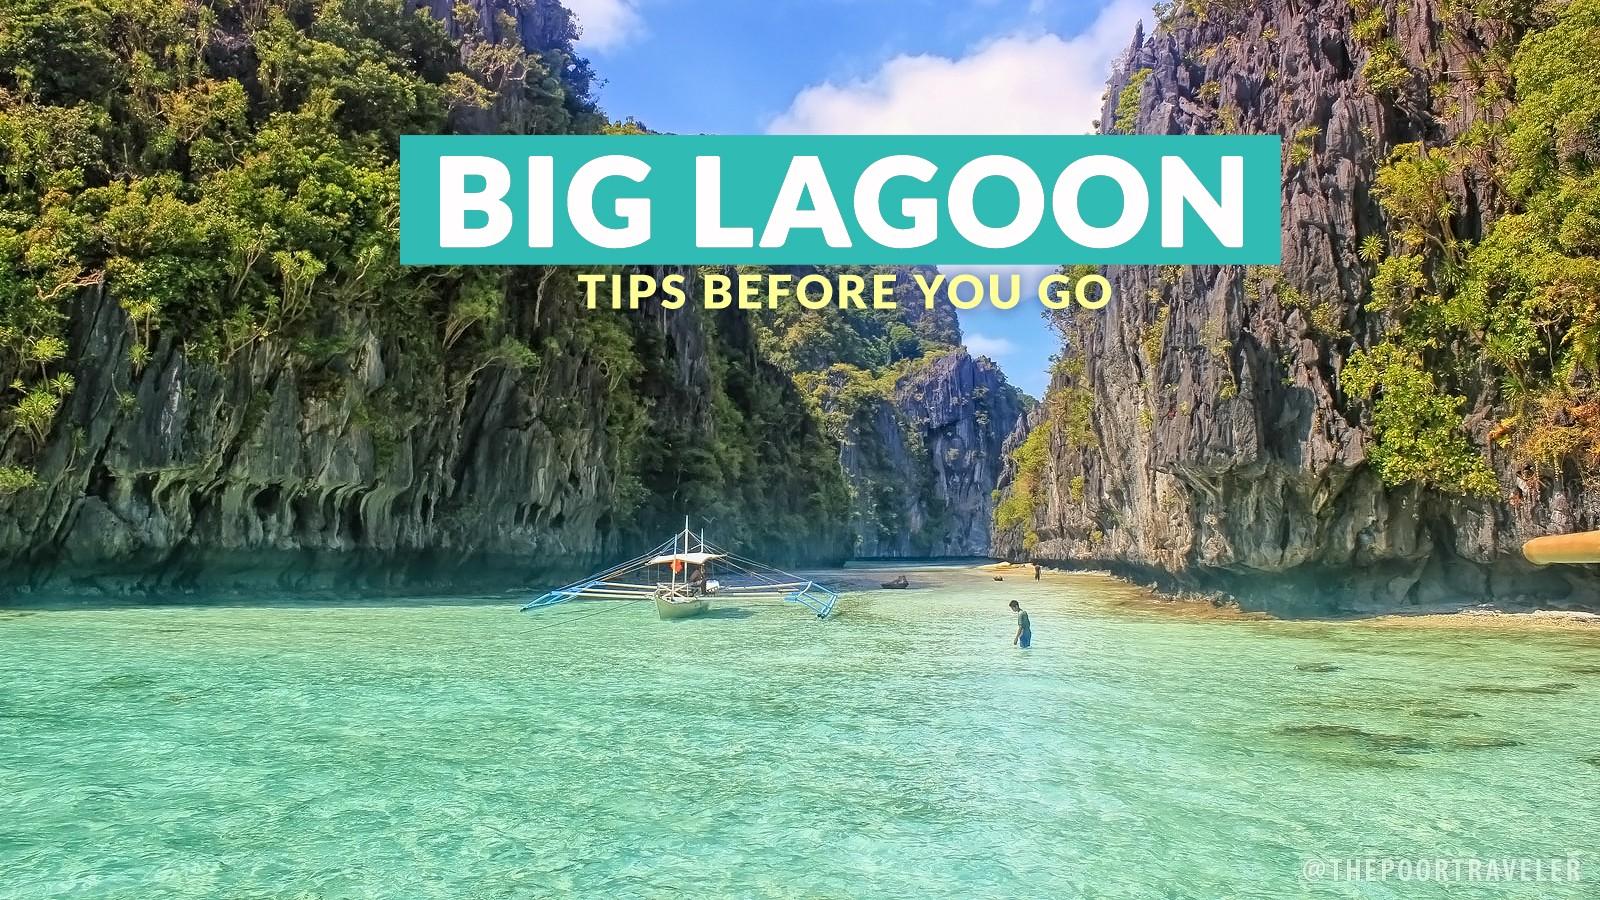 Big Lagoon El Nido Important Travel Tips Philippine